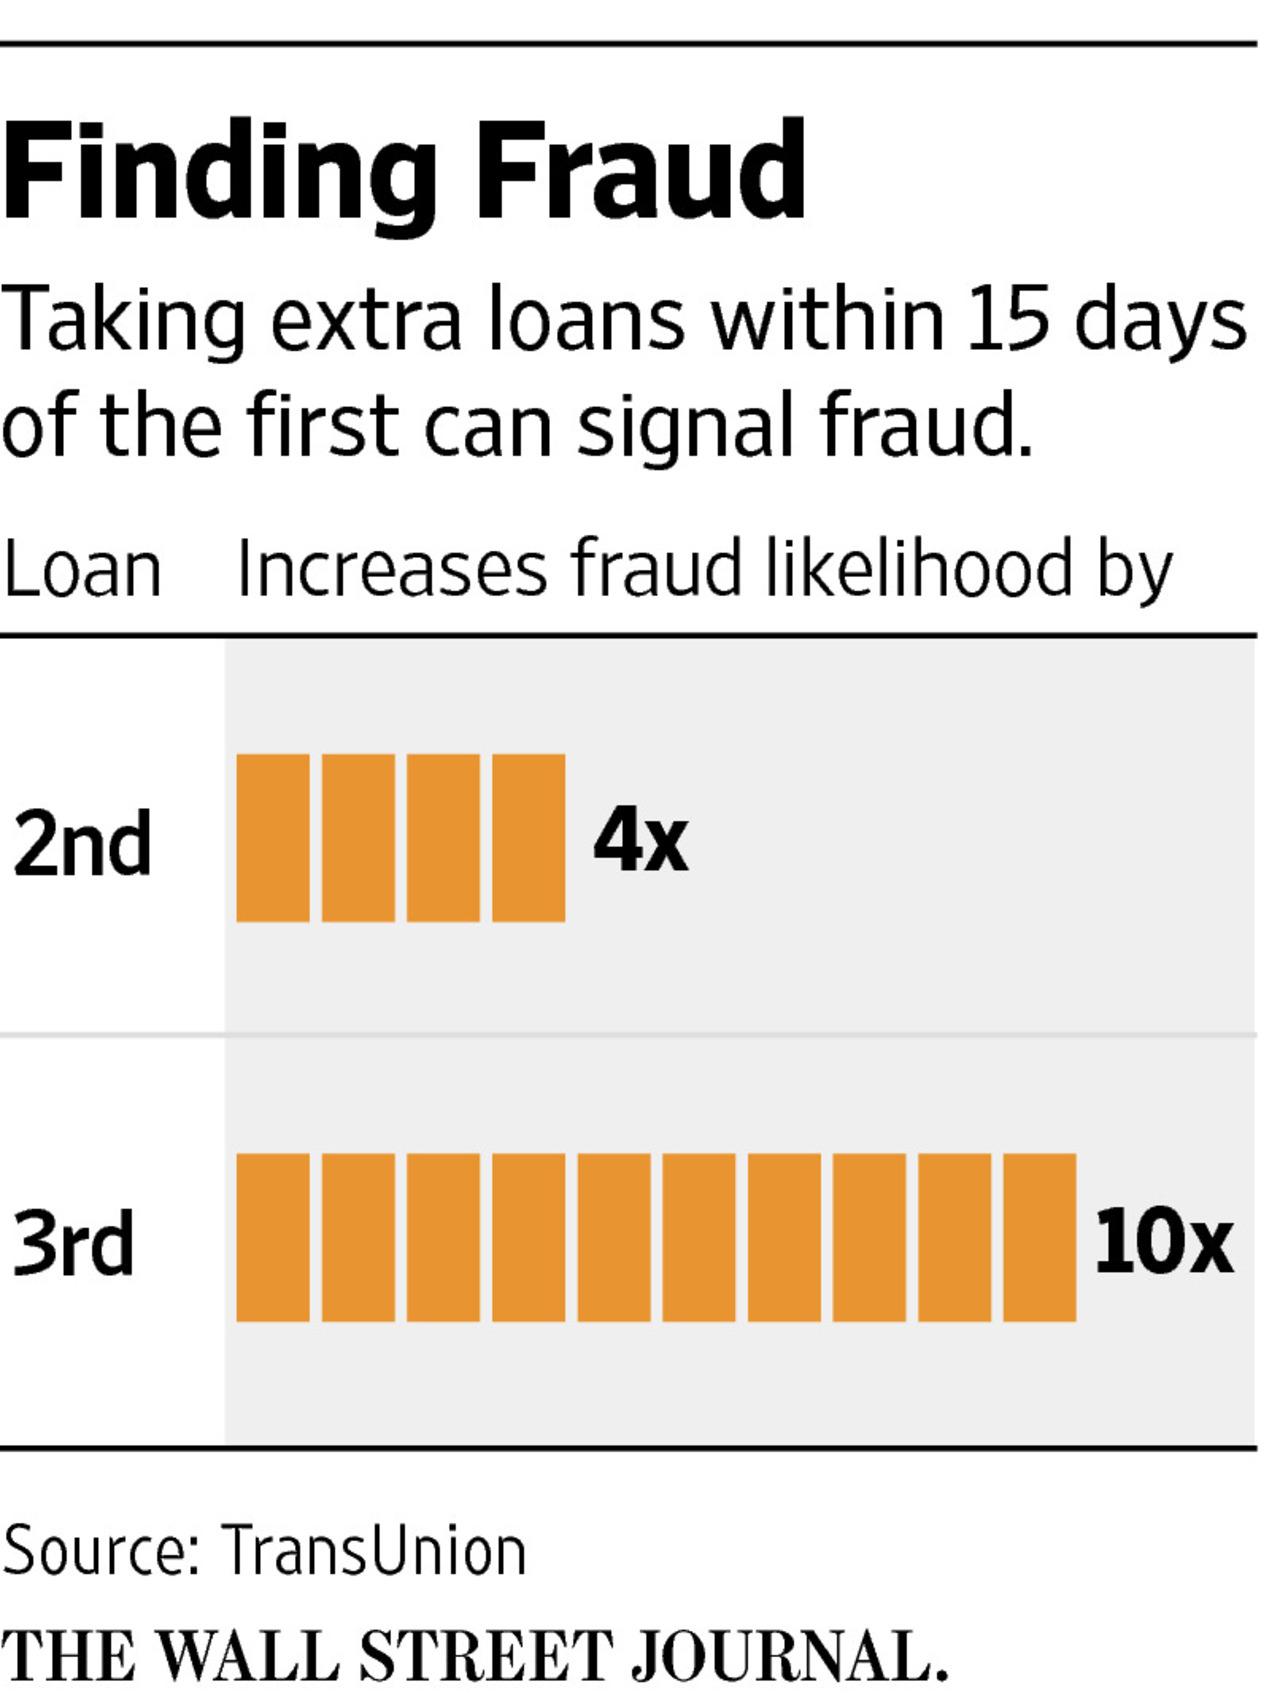 finding-fraud-bar-graph